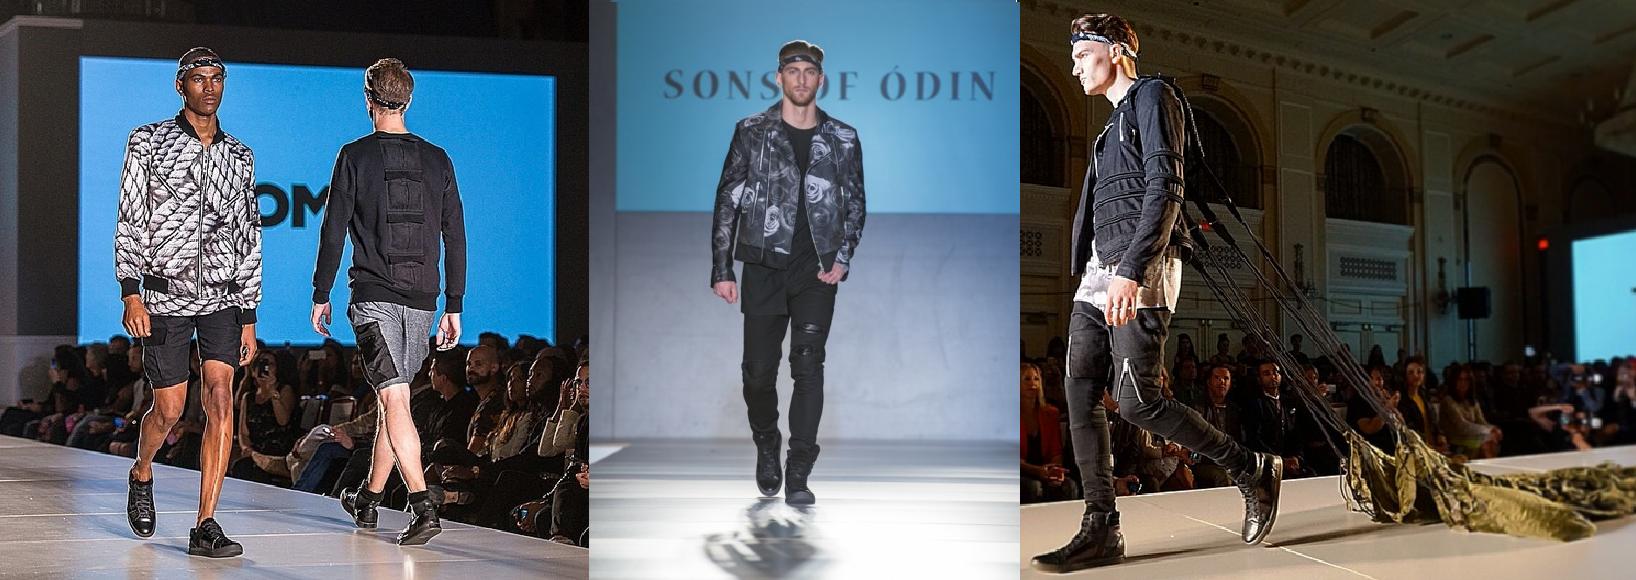 sons of odin Toronto Men's Fashion Week